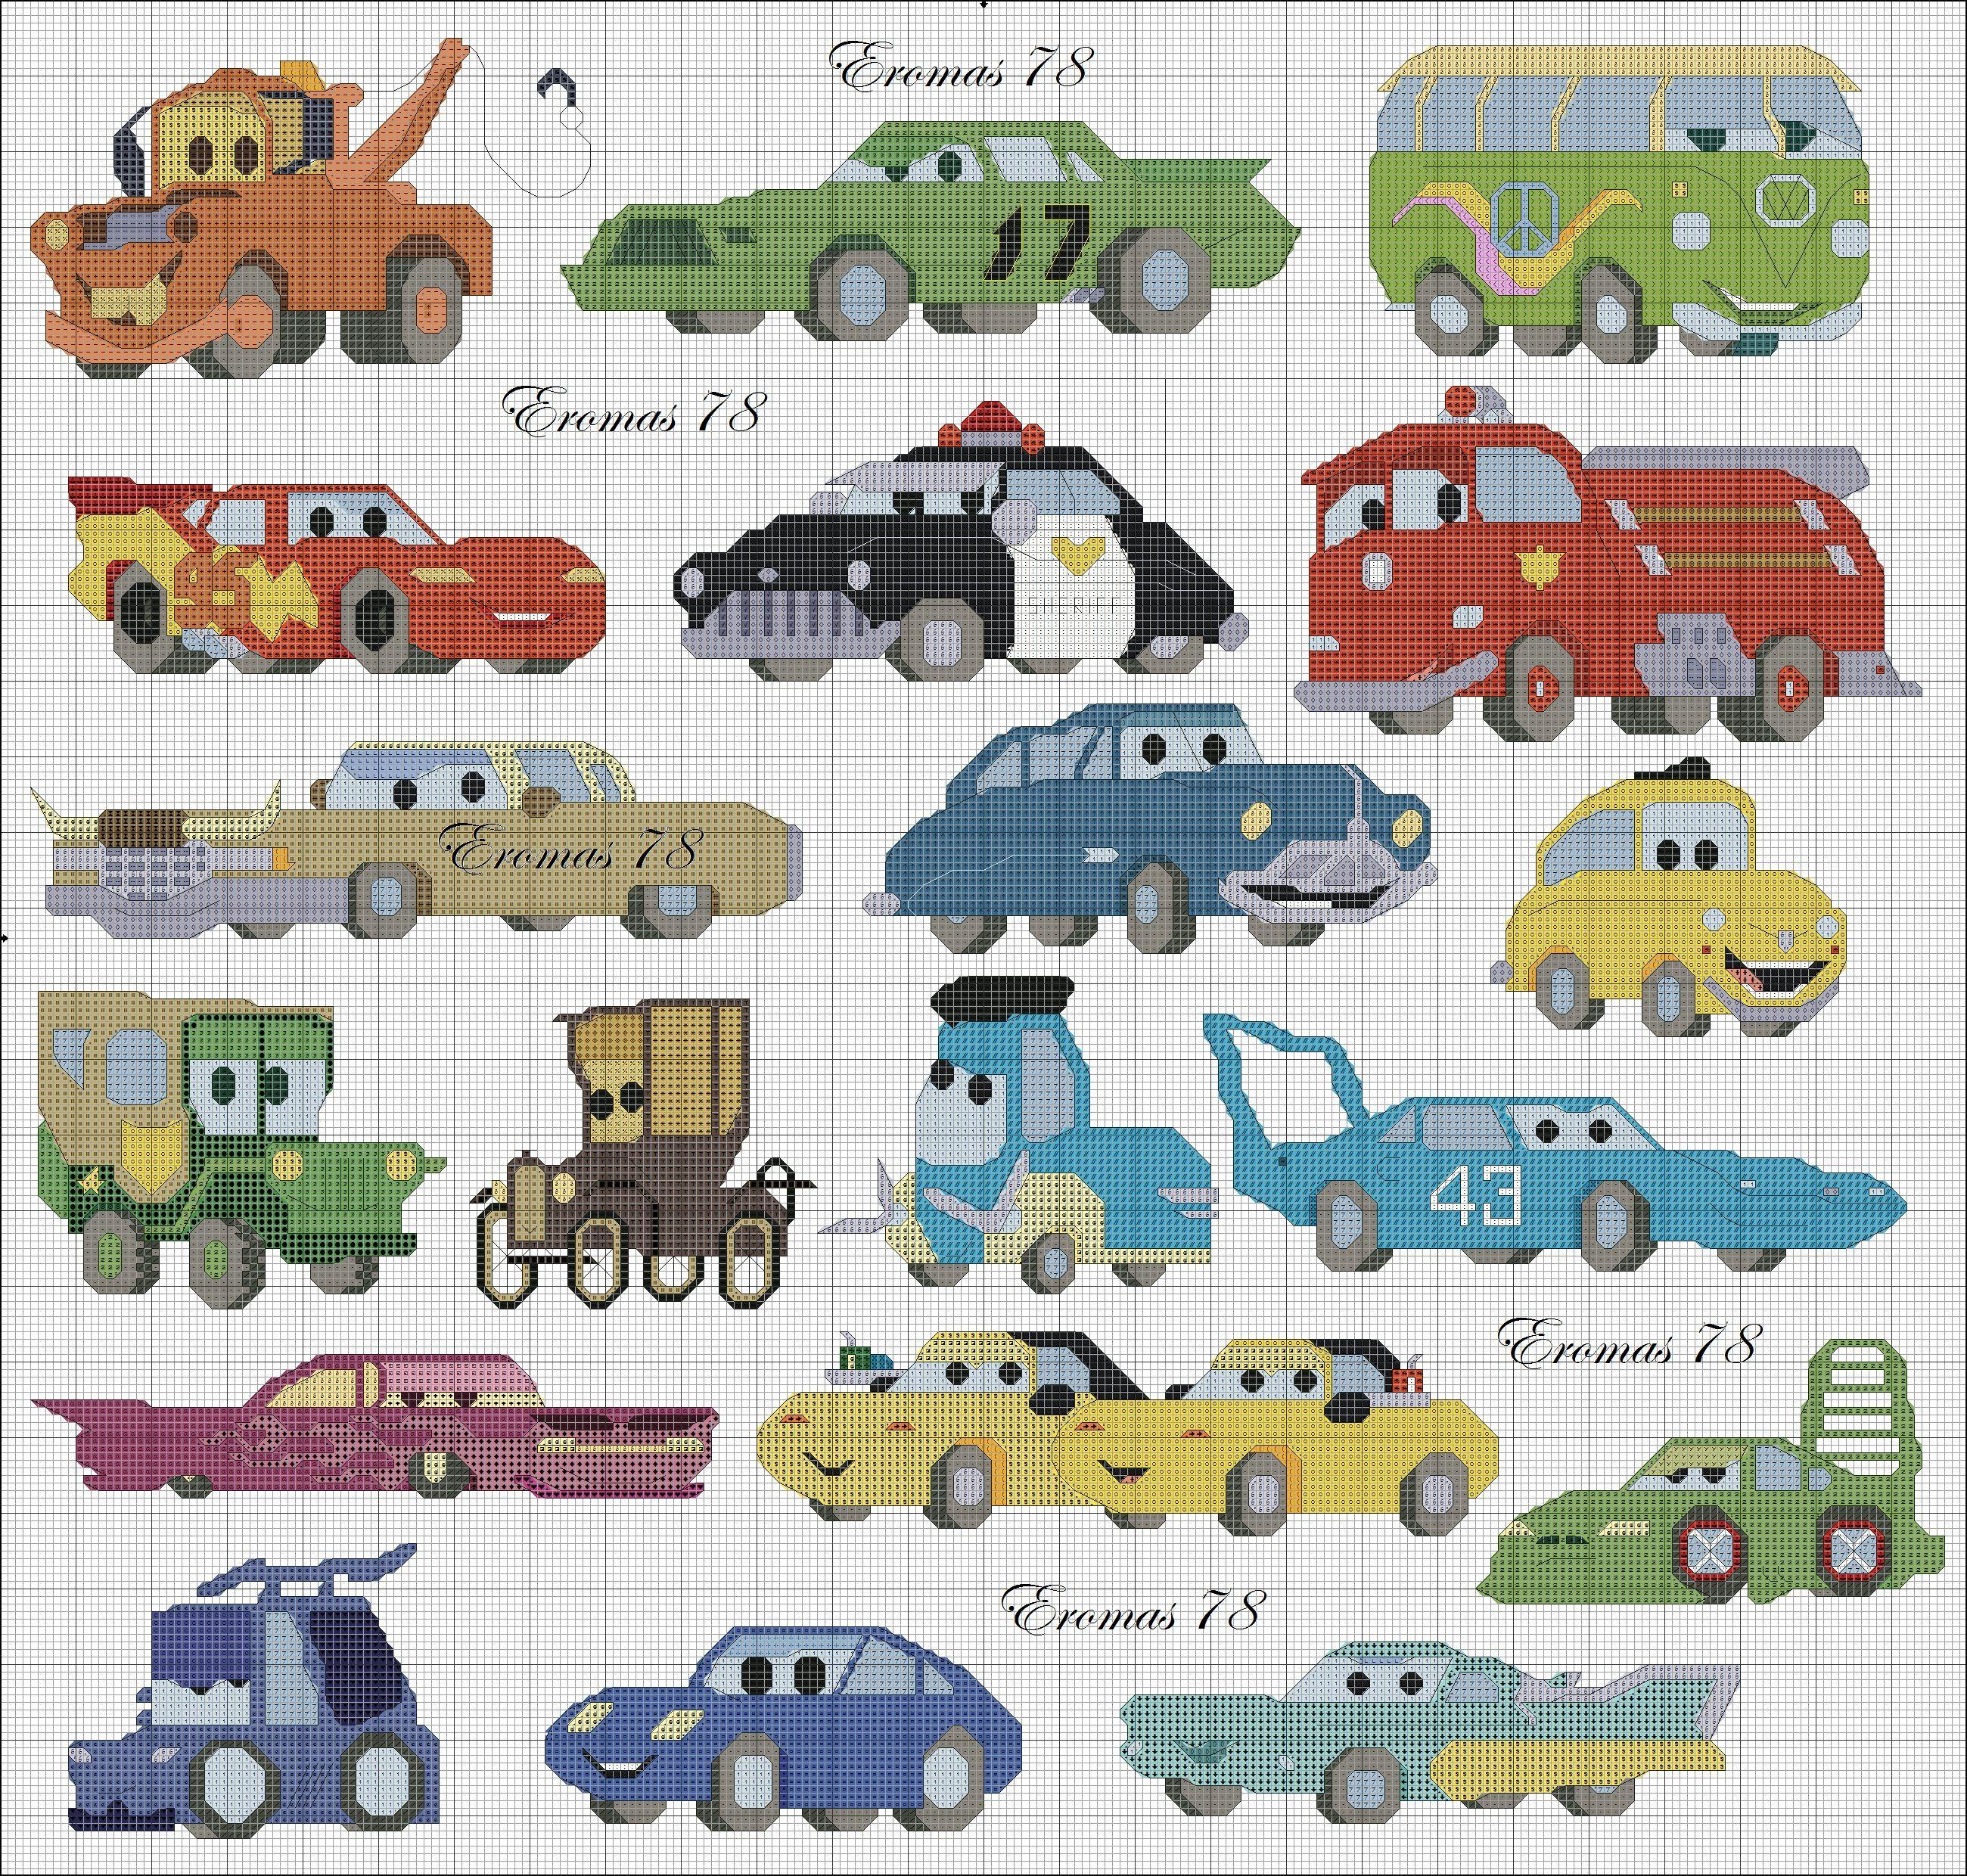 Cars Jpg Jpeg Afbeelding 2600 2480 Pixels Punto Croce Kit Punto Croce Bordi A Punto Croce